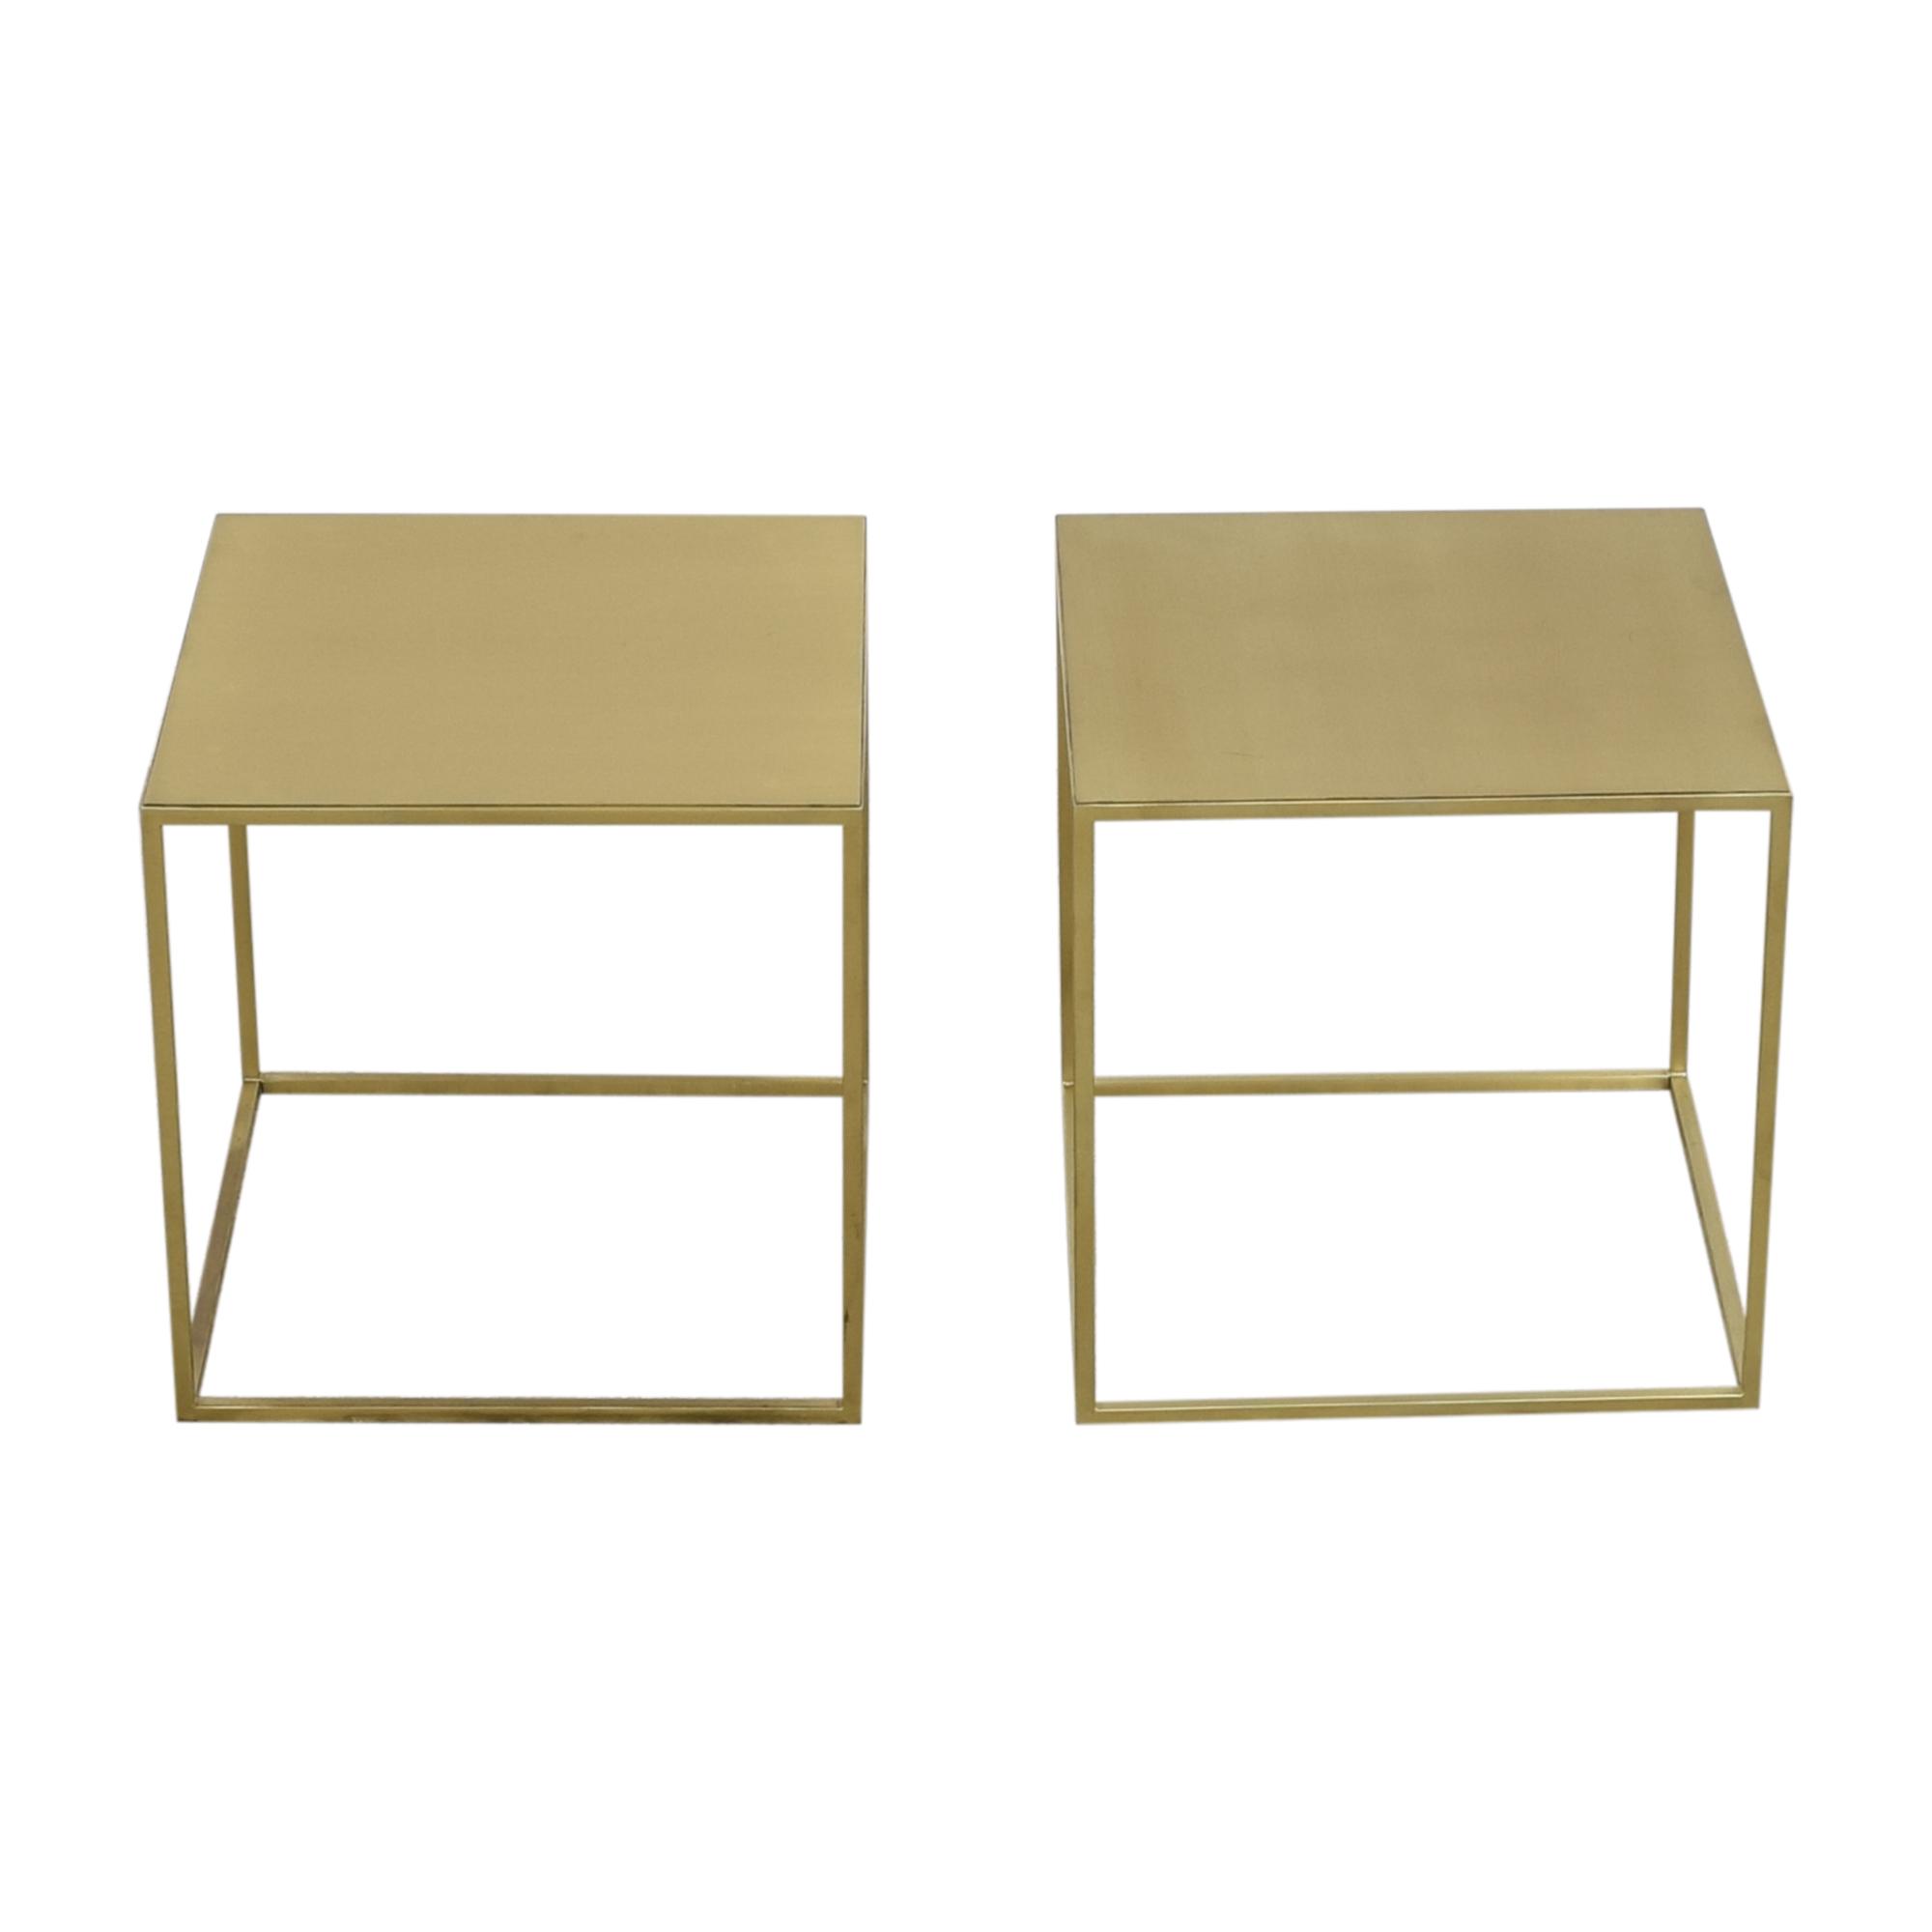 Custom Cube End Tables dimensions